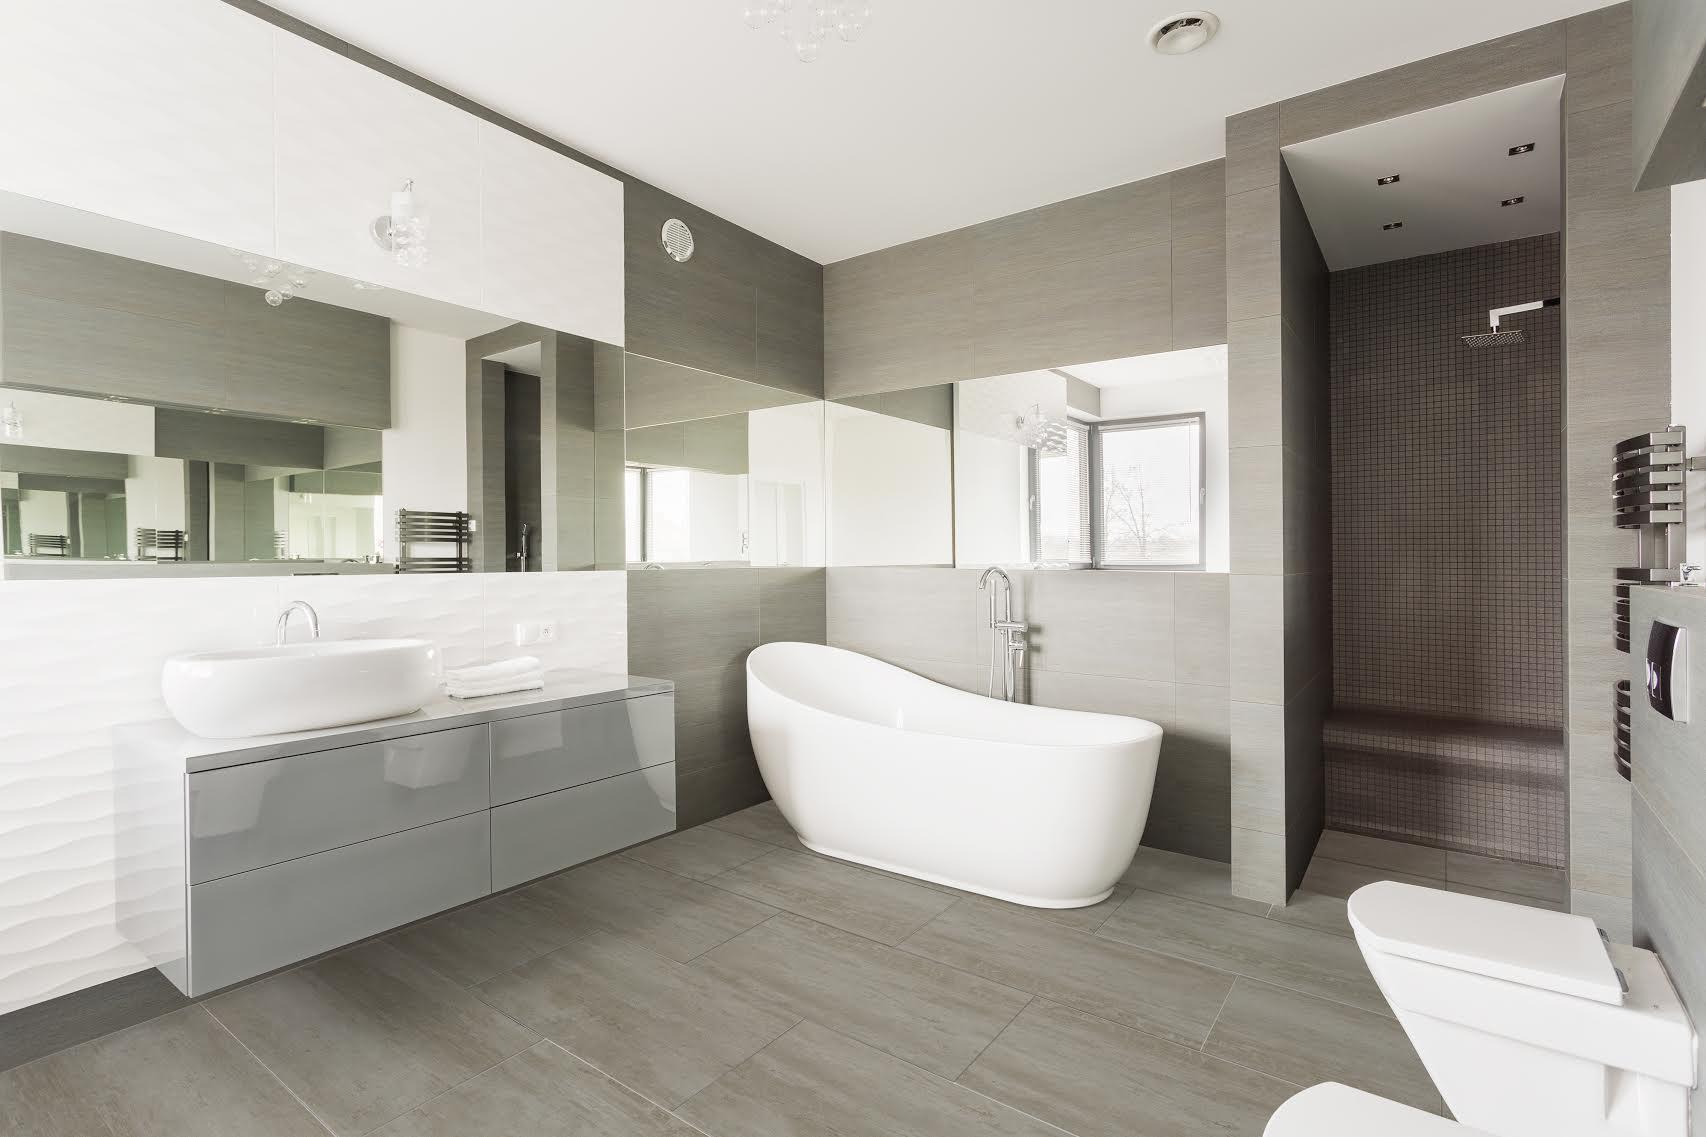 Image showing wood flooring in a bathroom.